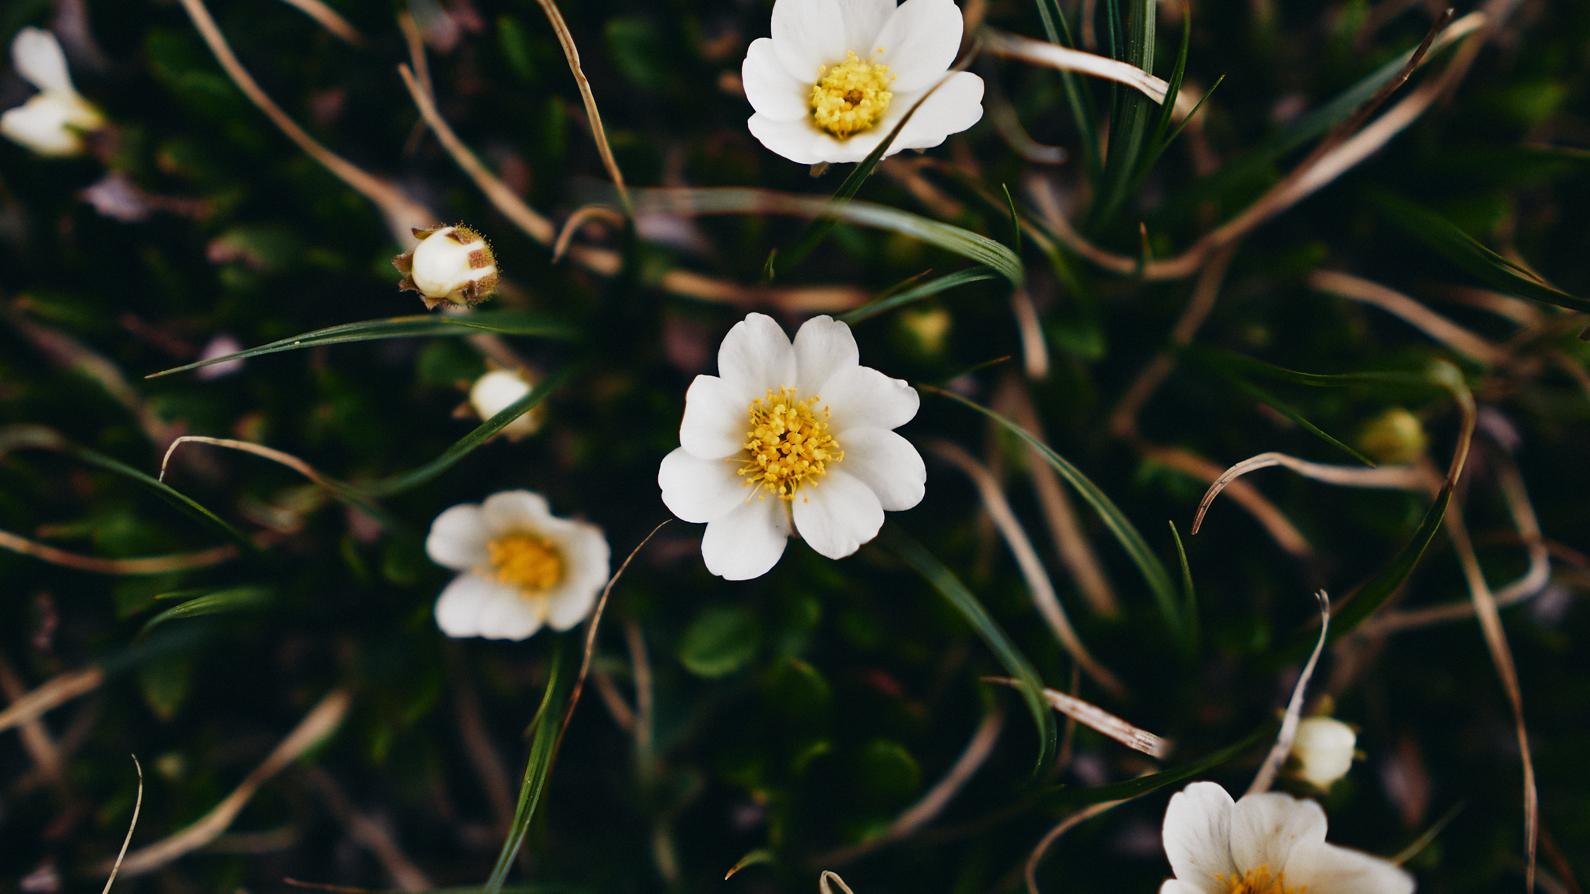 macro photo of white flowers sigh sigma 16mm f1.4